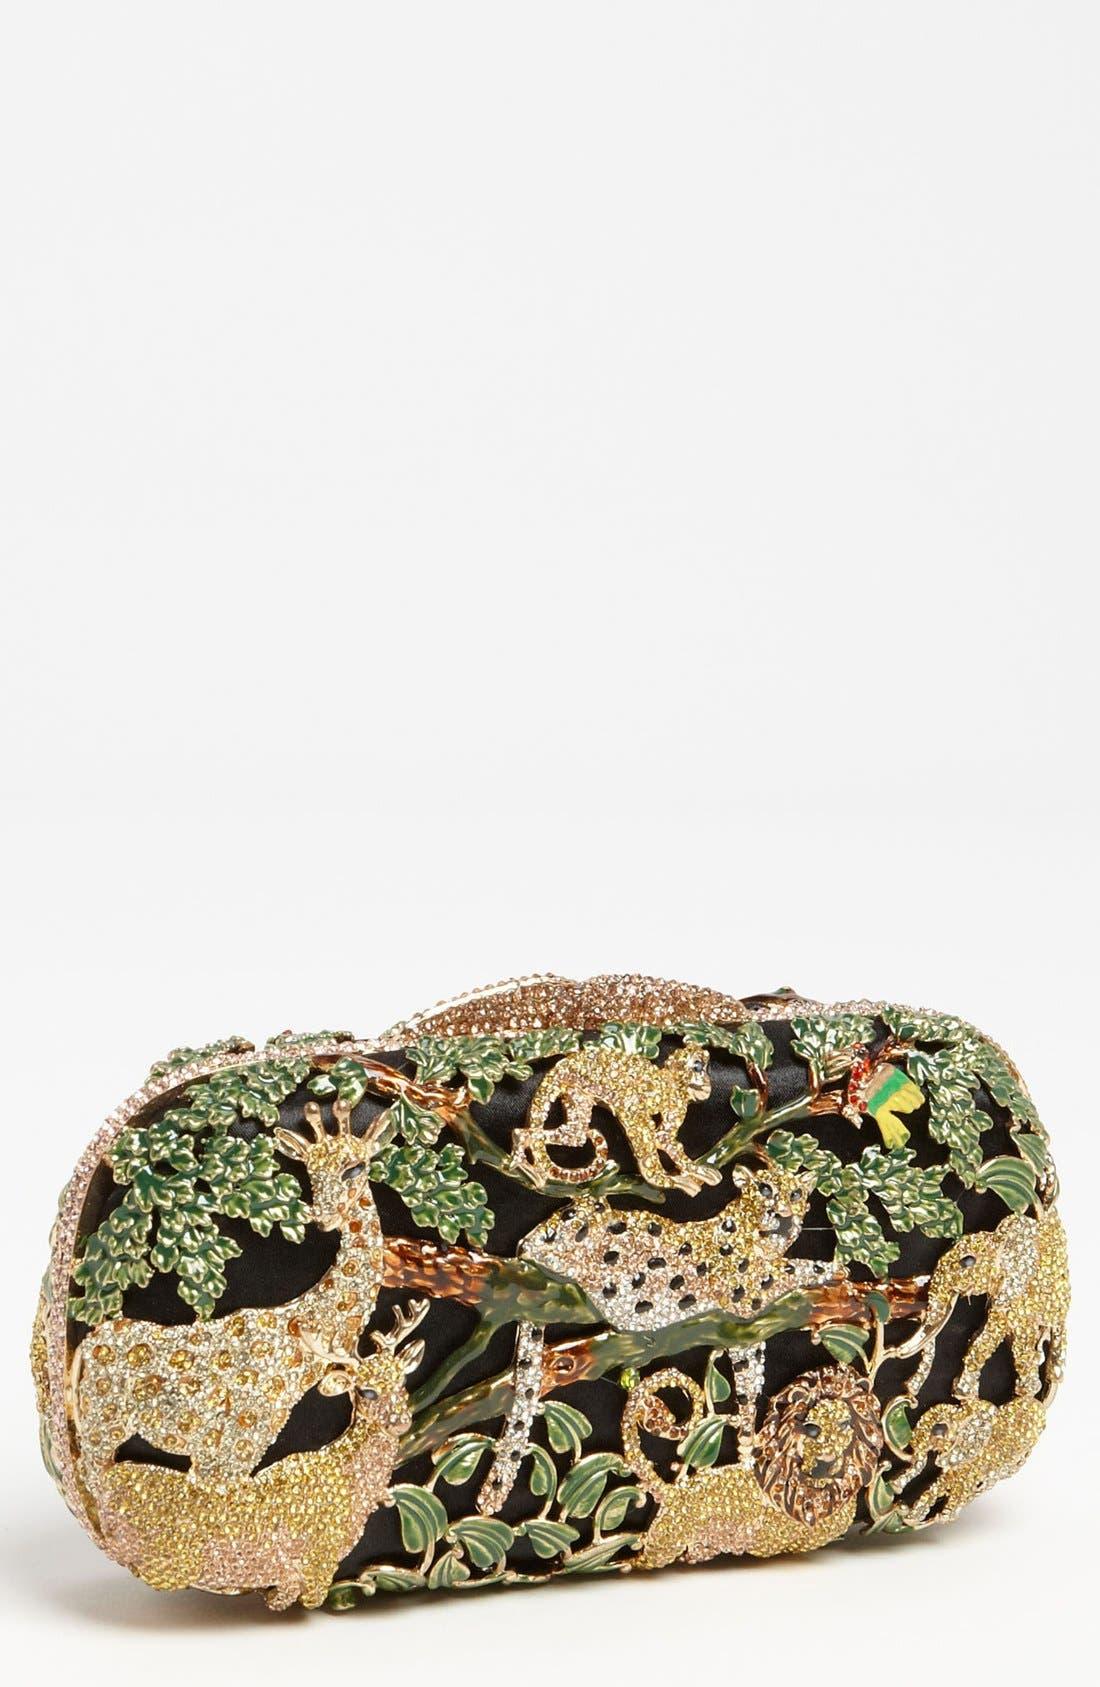 Alternate Image 1 Selected - Tasha 'Jungle' Clutch